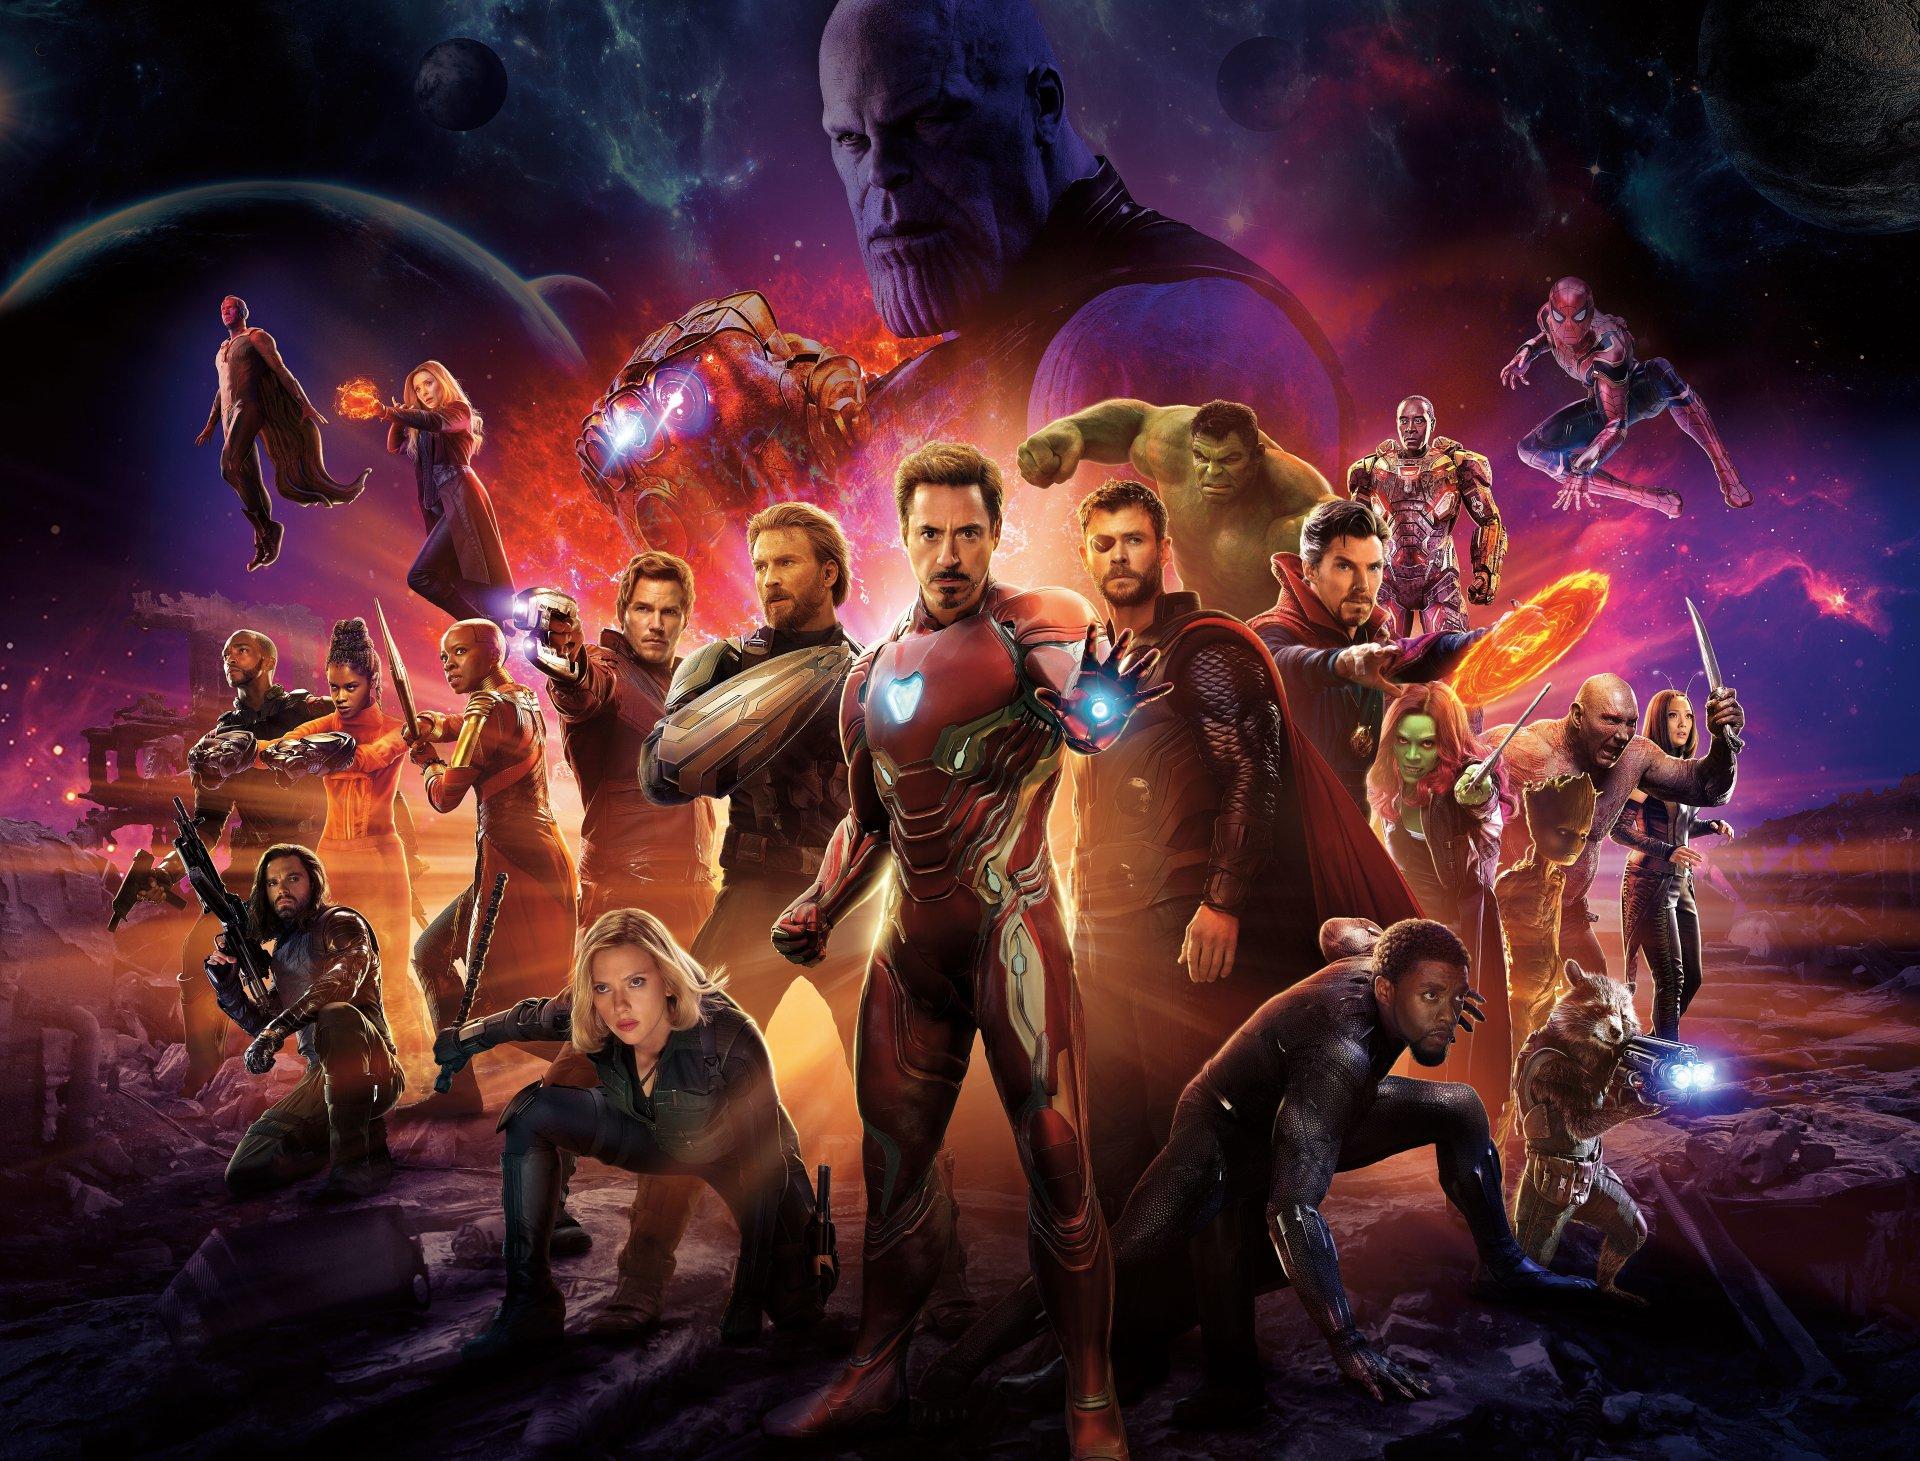 Fondos De Pantalla De Quikis: Fondos De Los Vengadores Infinity War, Wallpapers Avengers